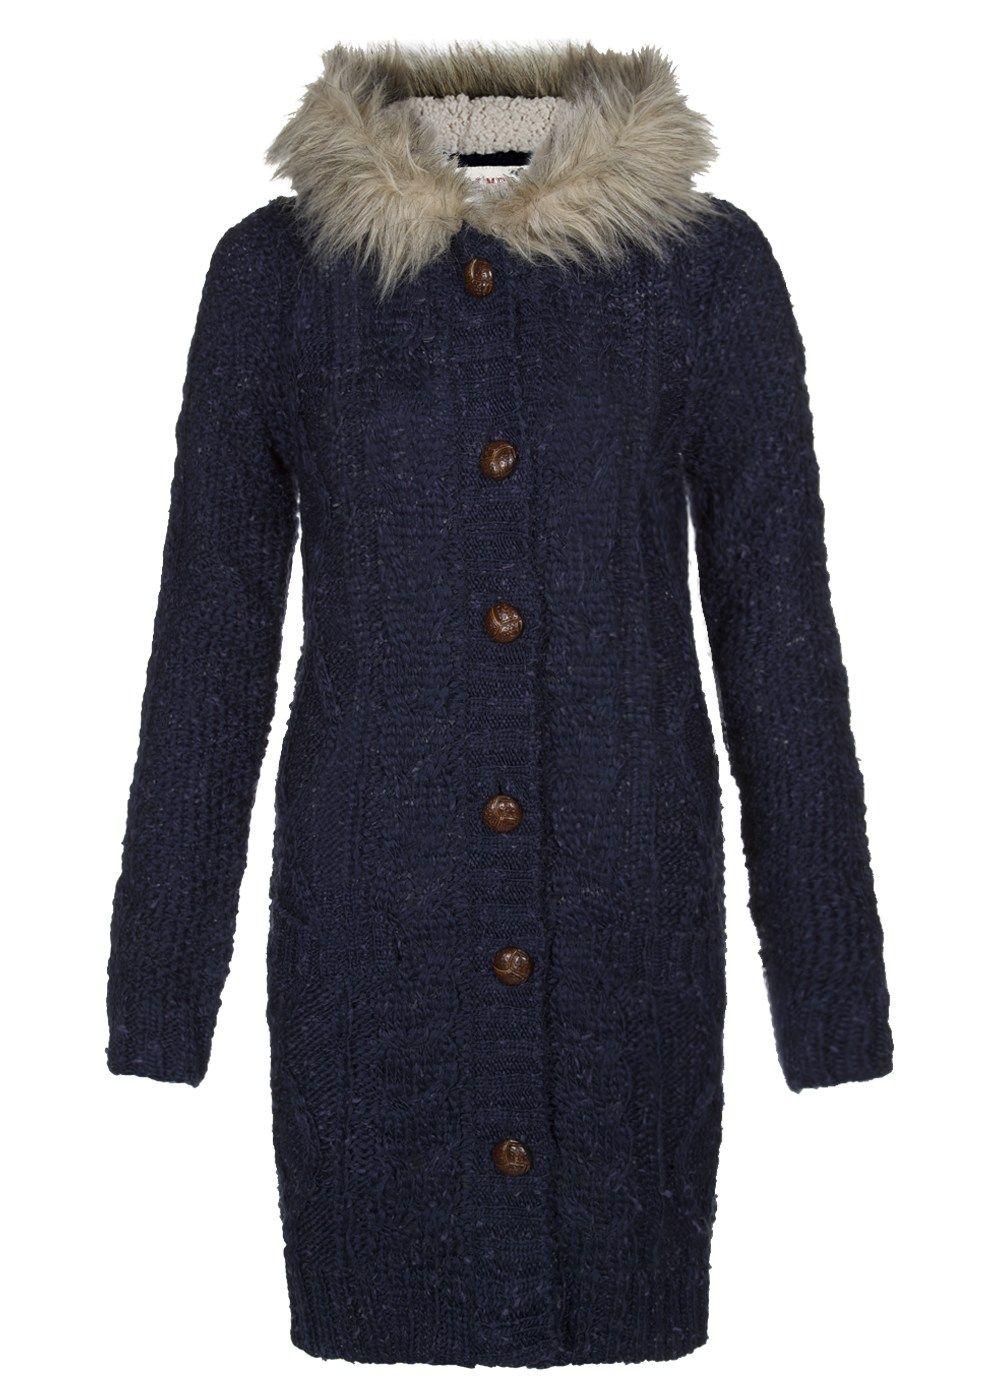 a721ebcca Falmer Hooded Cardigan - Matalan £35 | Pretties :) | Hooded cardigan ...